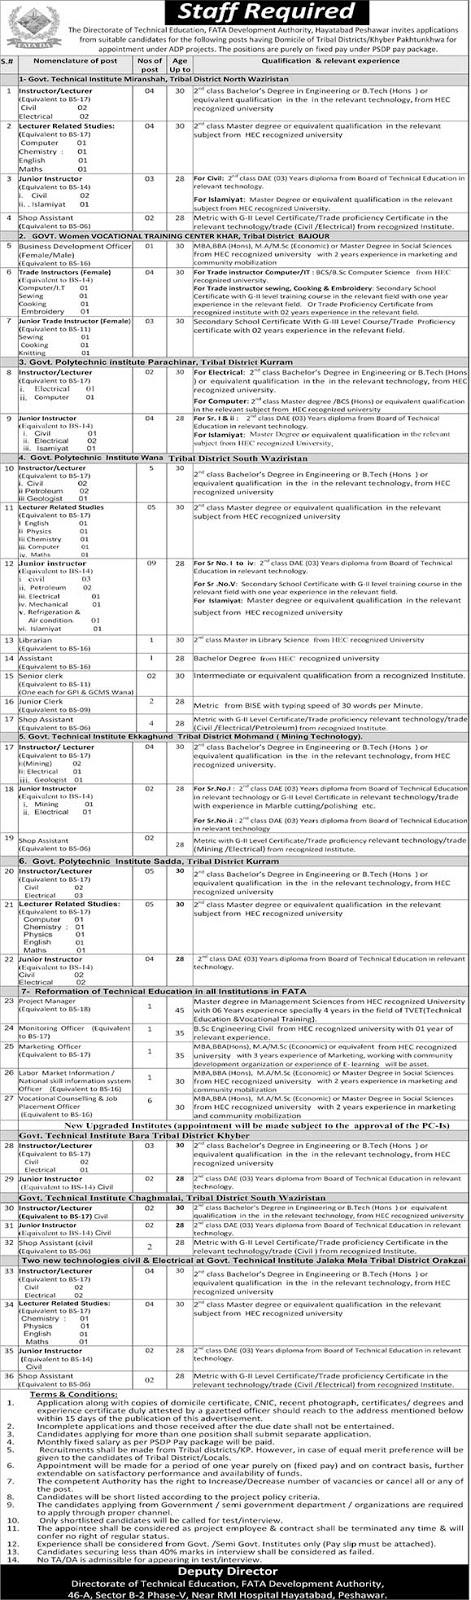 FATA Development Authority Jobs August 2018 [ 110+ Vacancies ]